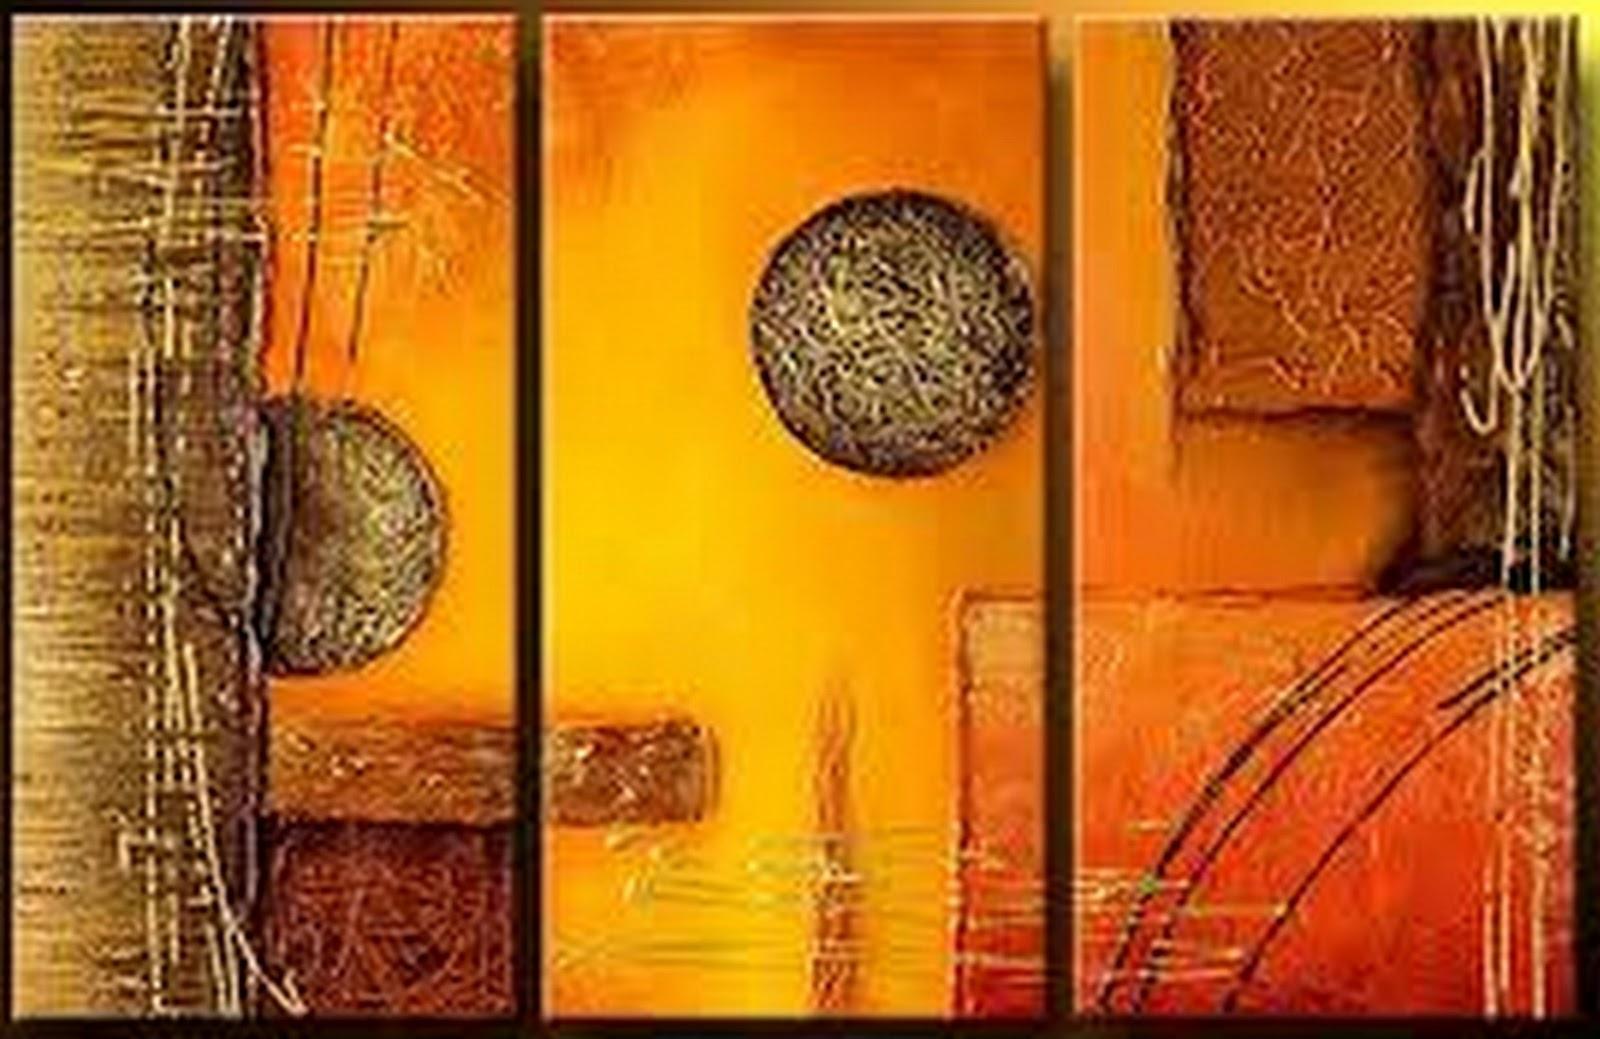 Pinturas cuadros lienzos cuadros abstractos modernos - Laminas decorativas para pared ...